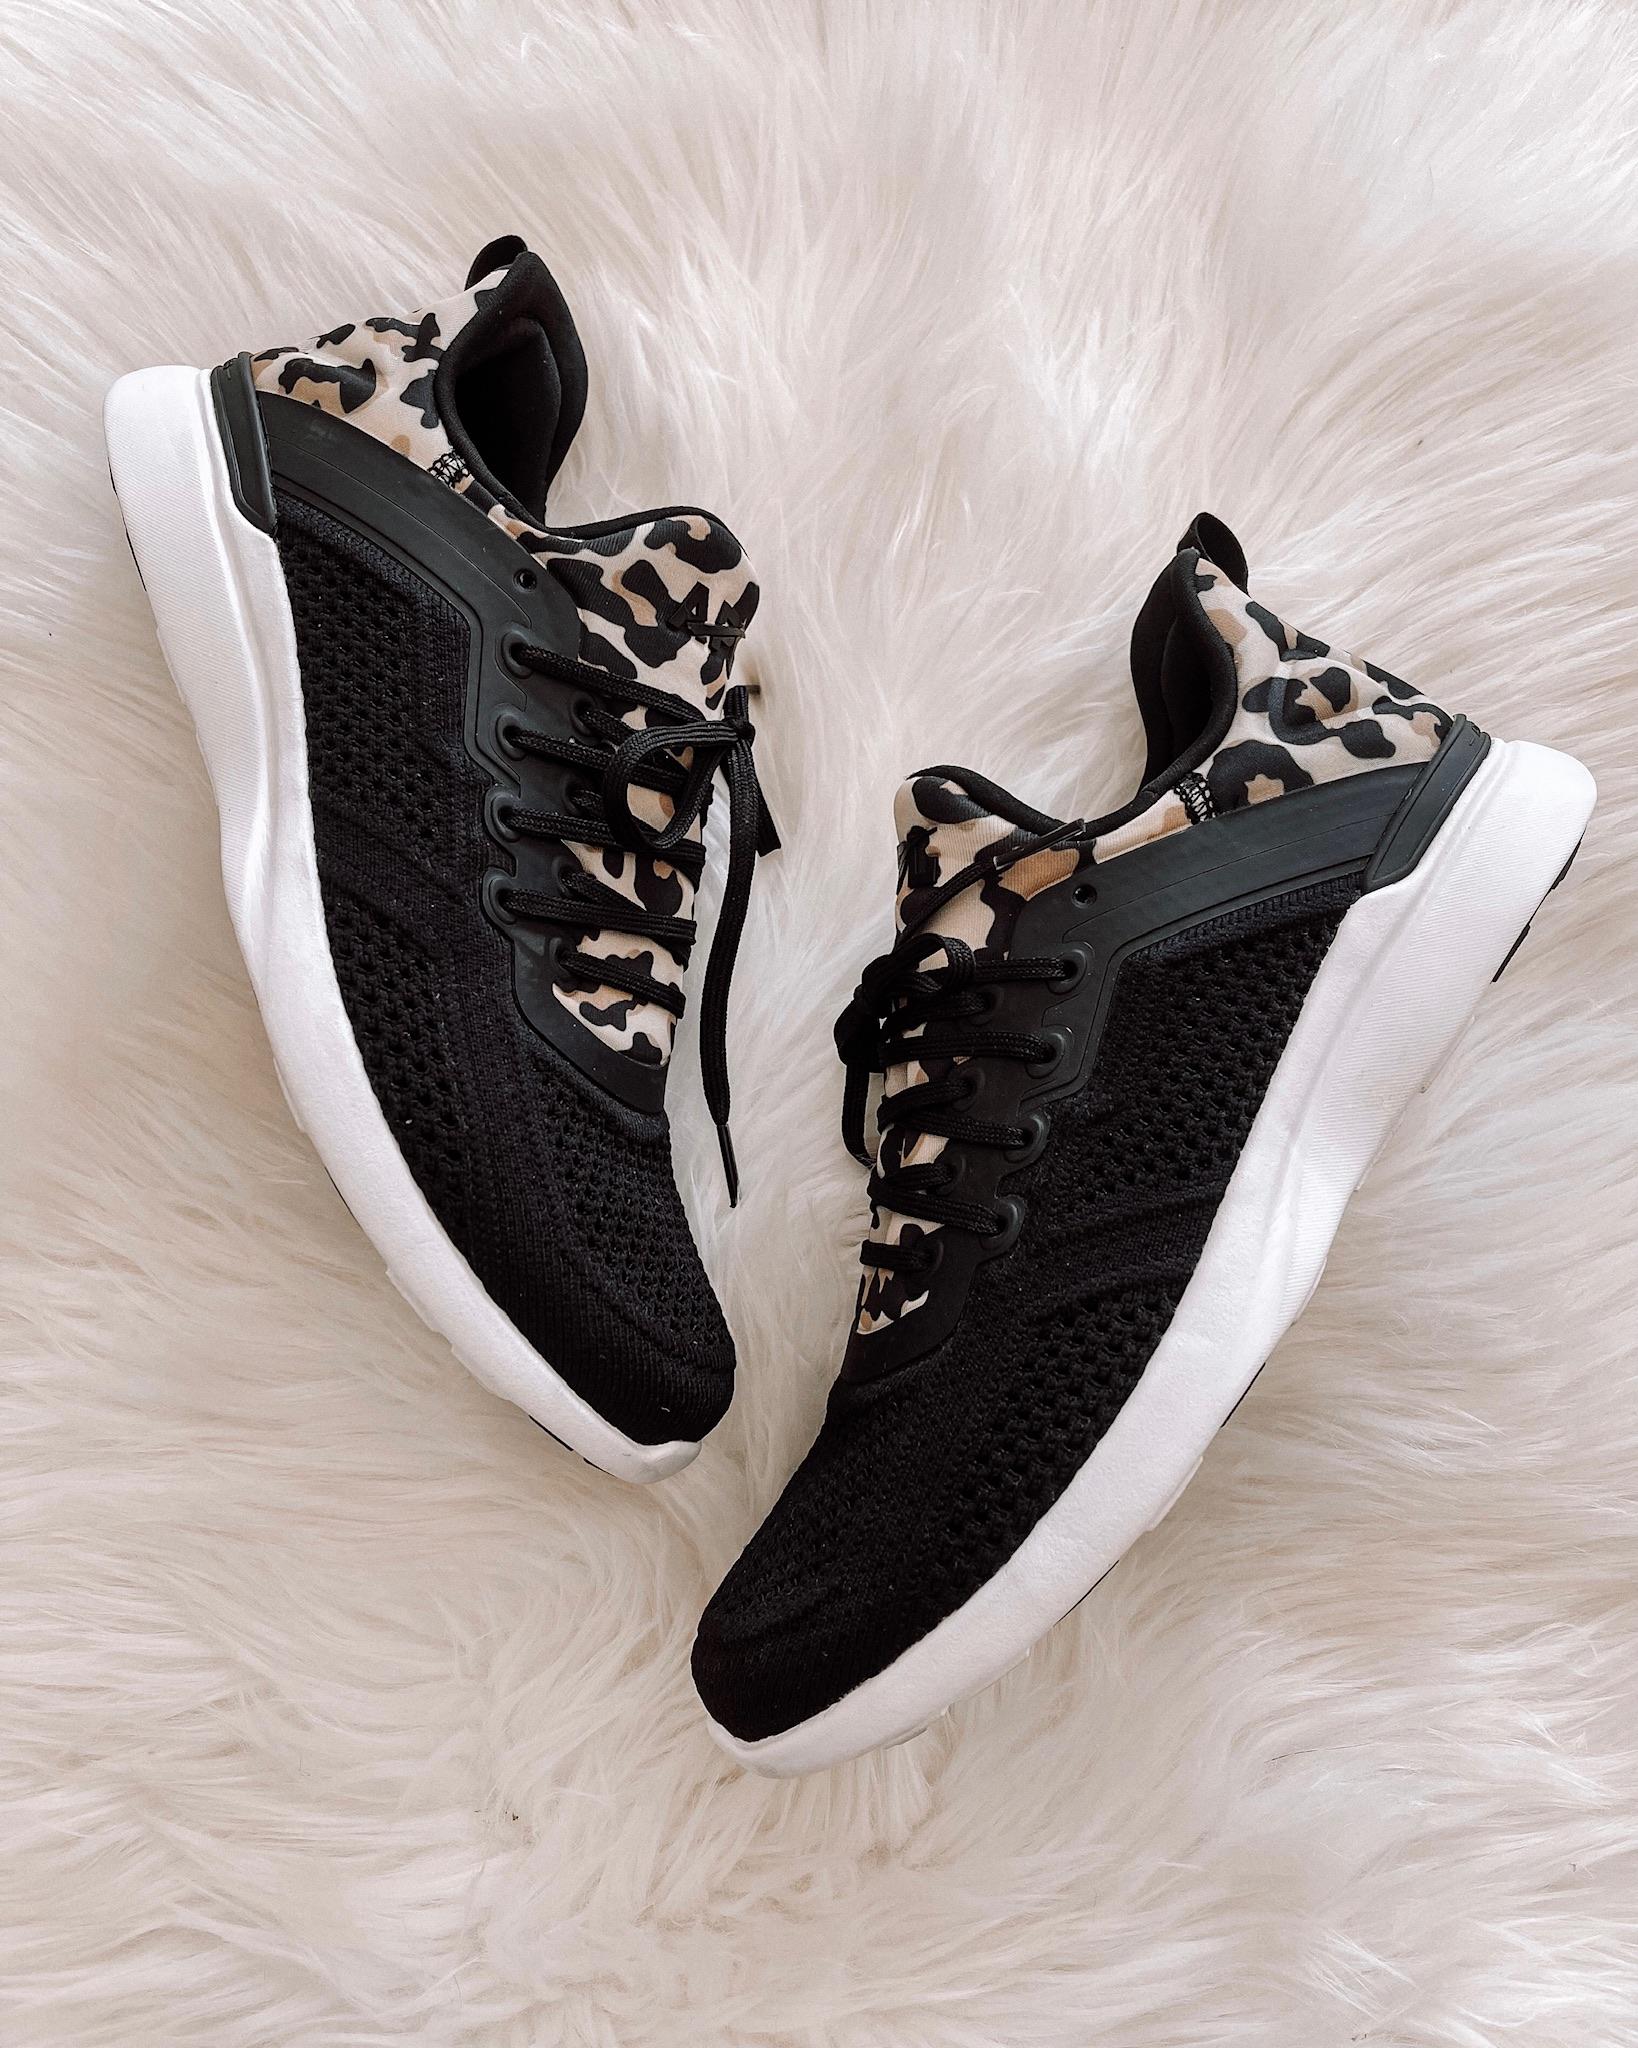 Fashion Jackson APL TechLoom Tracer Knit Training Shoes